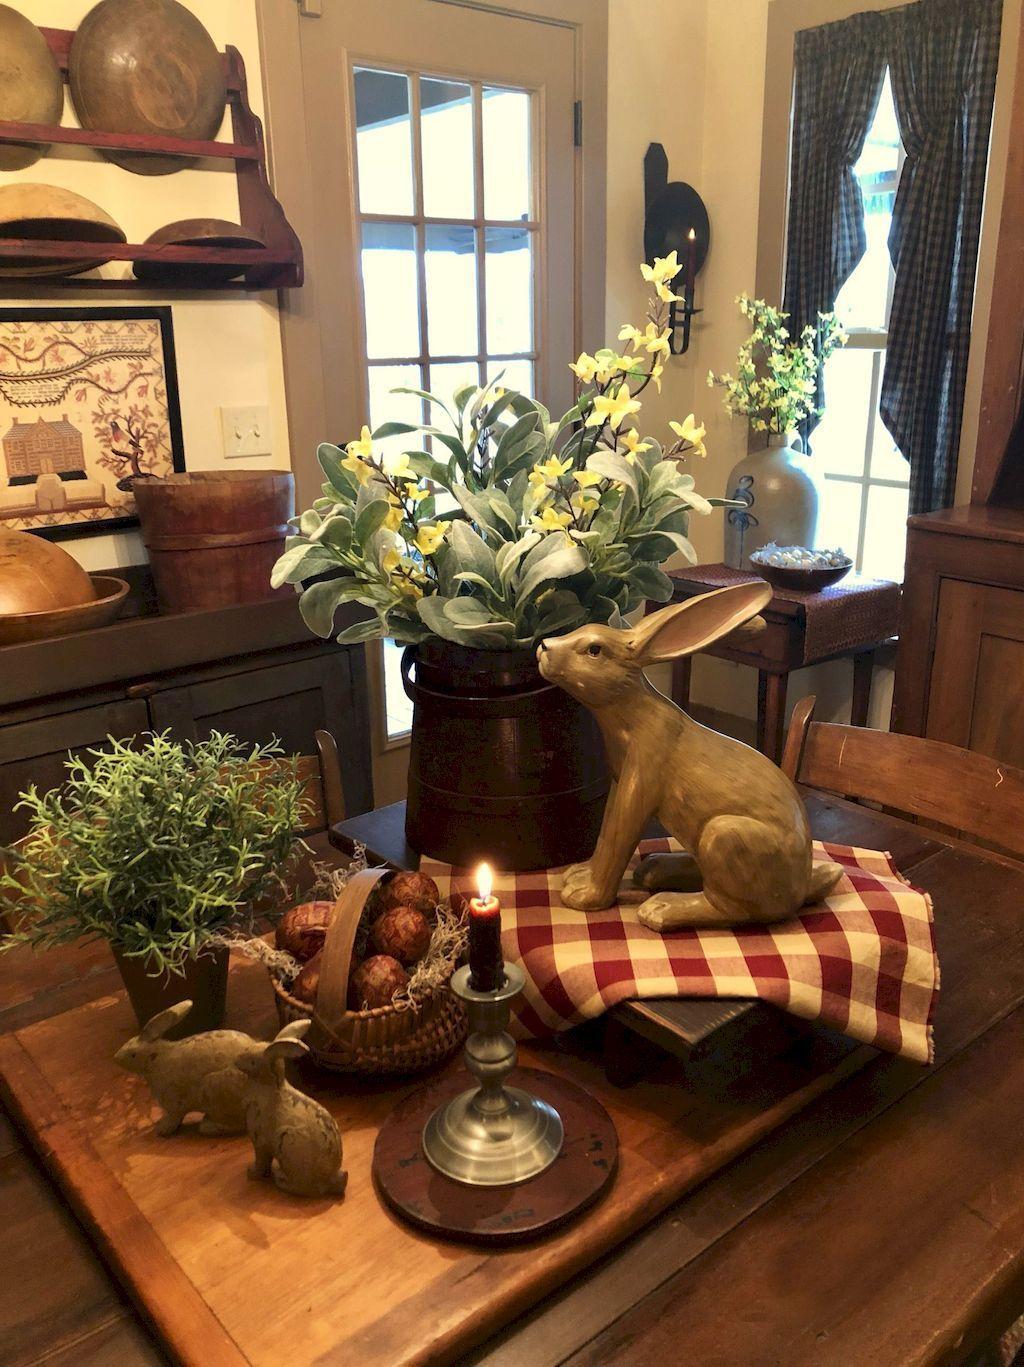 55 Awesome Farmhouse Spring Decor Ideas On A Budget Primitive